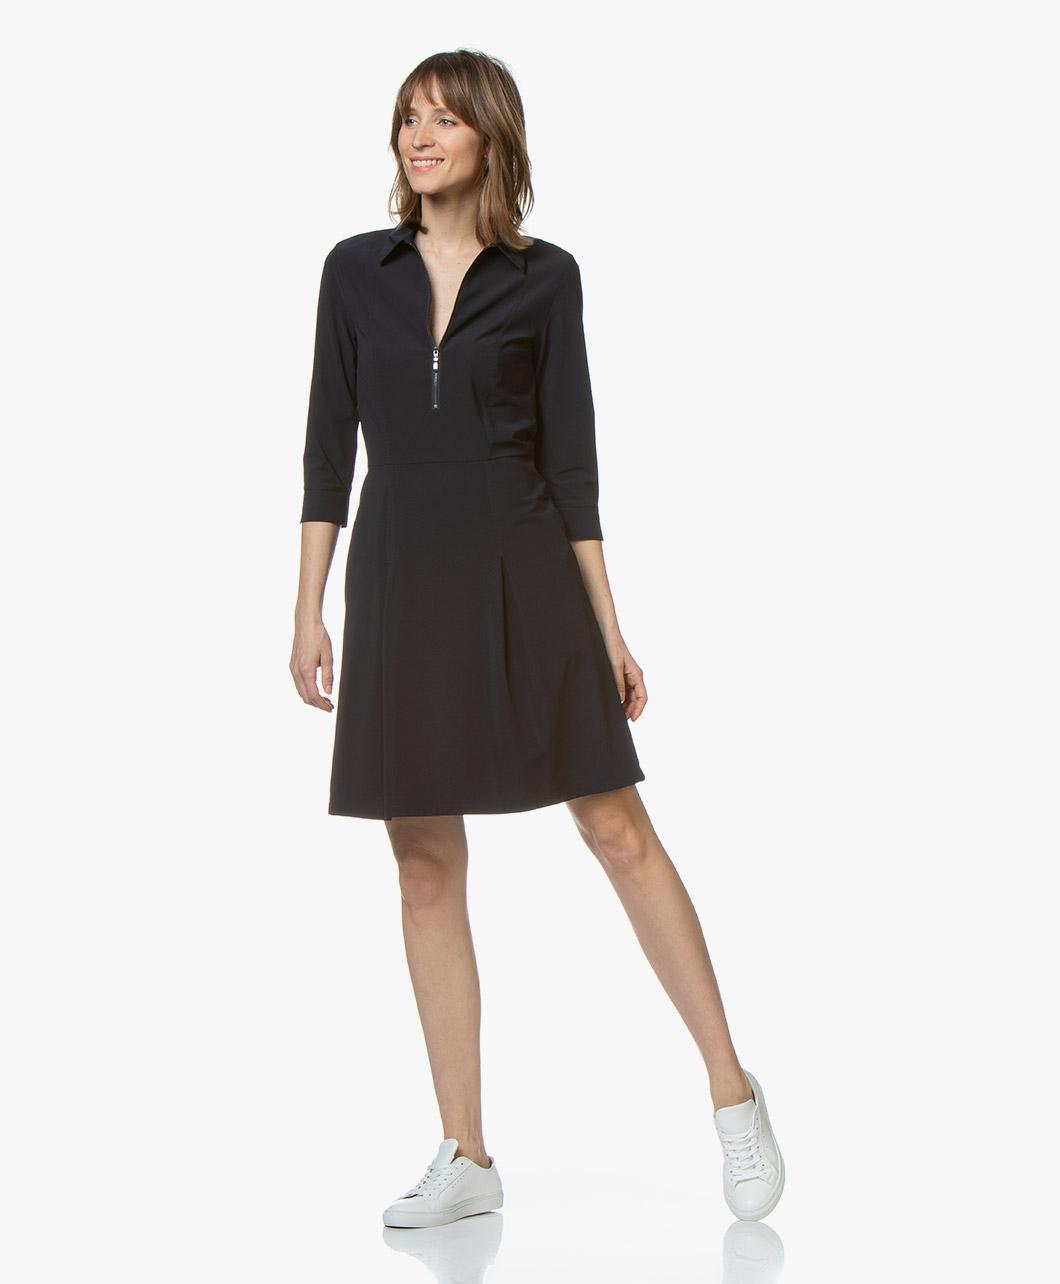 9cd781de40db78 Josephine   Co Rudie Fit   FlareTravel Jersey Dress - Navy - rudie dress